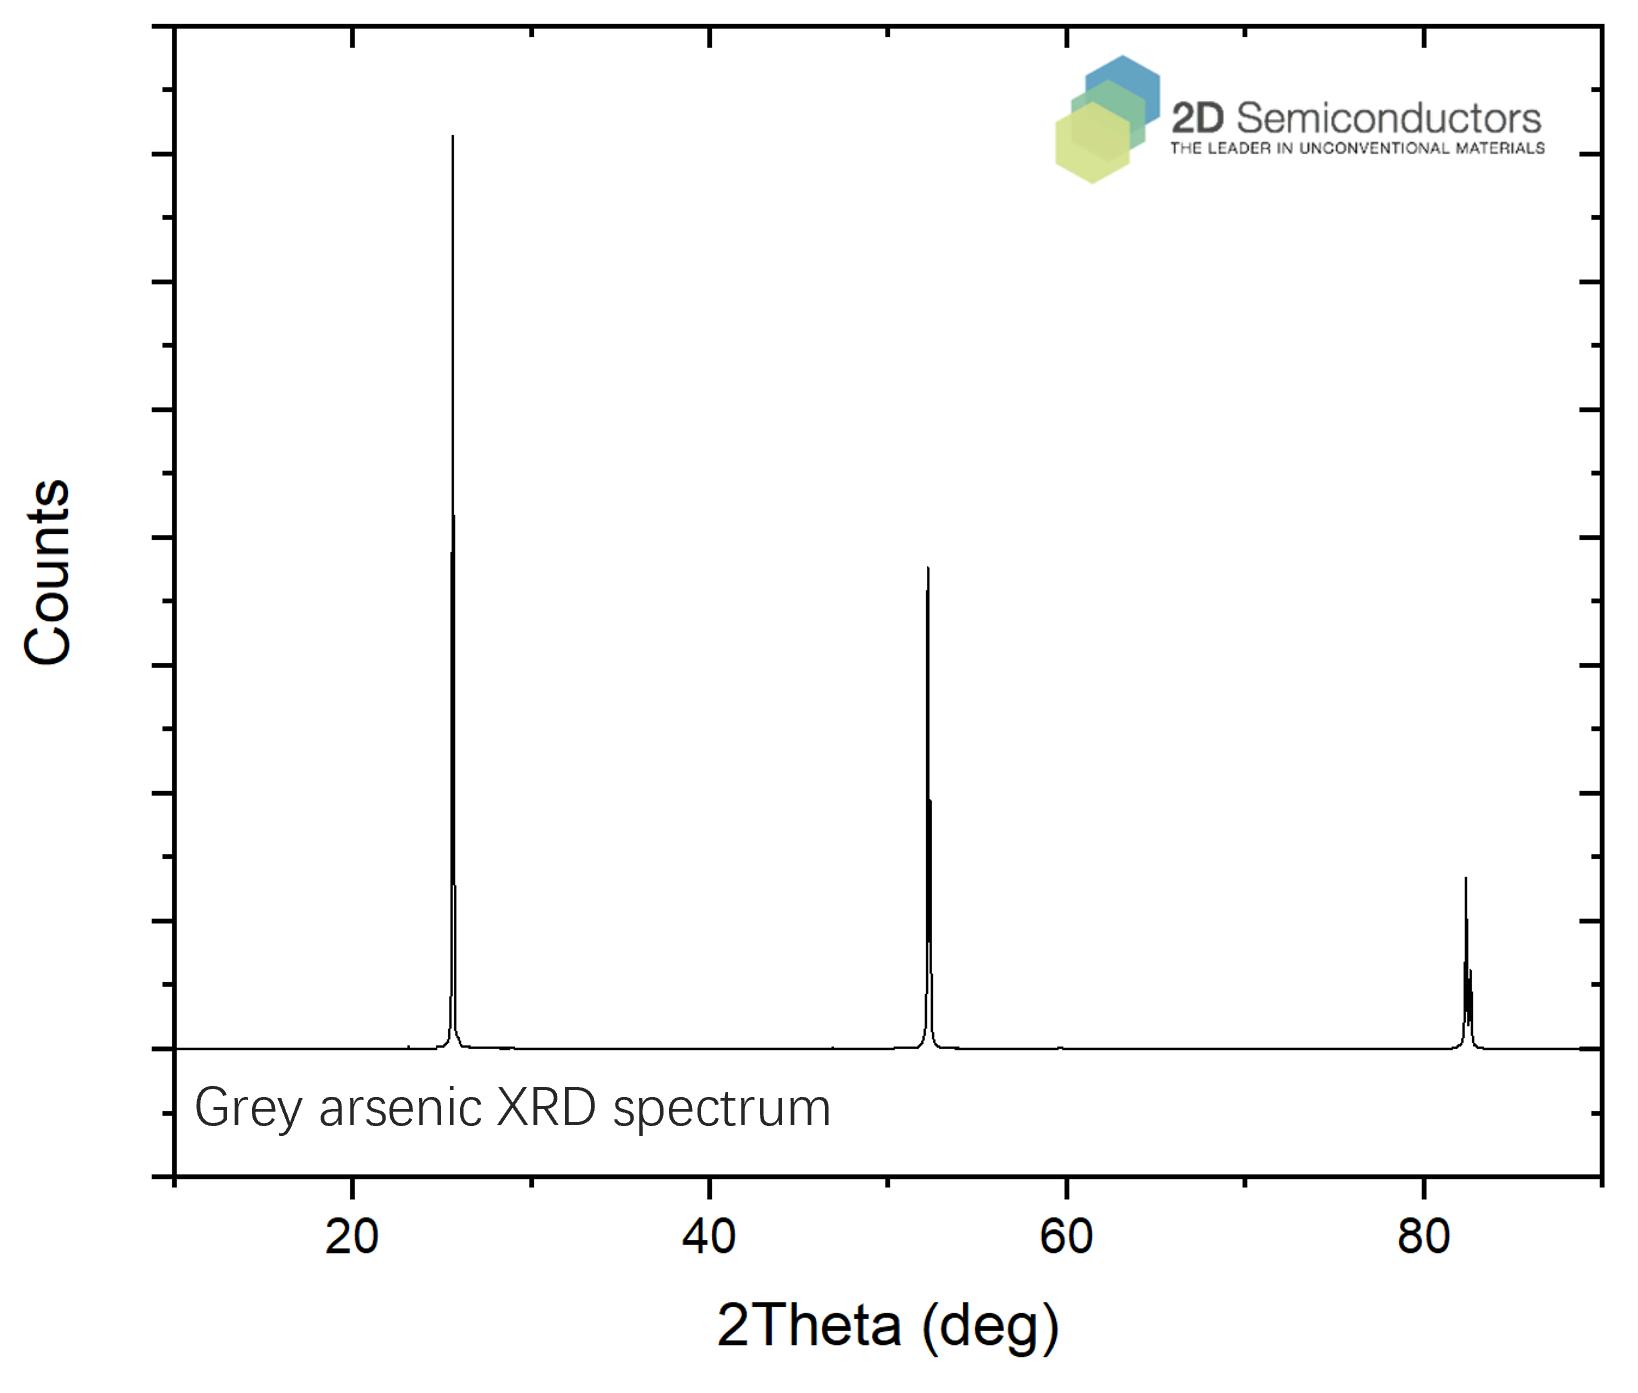 grey-arsenic-xrd-spectrum.png